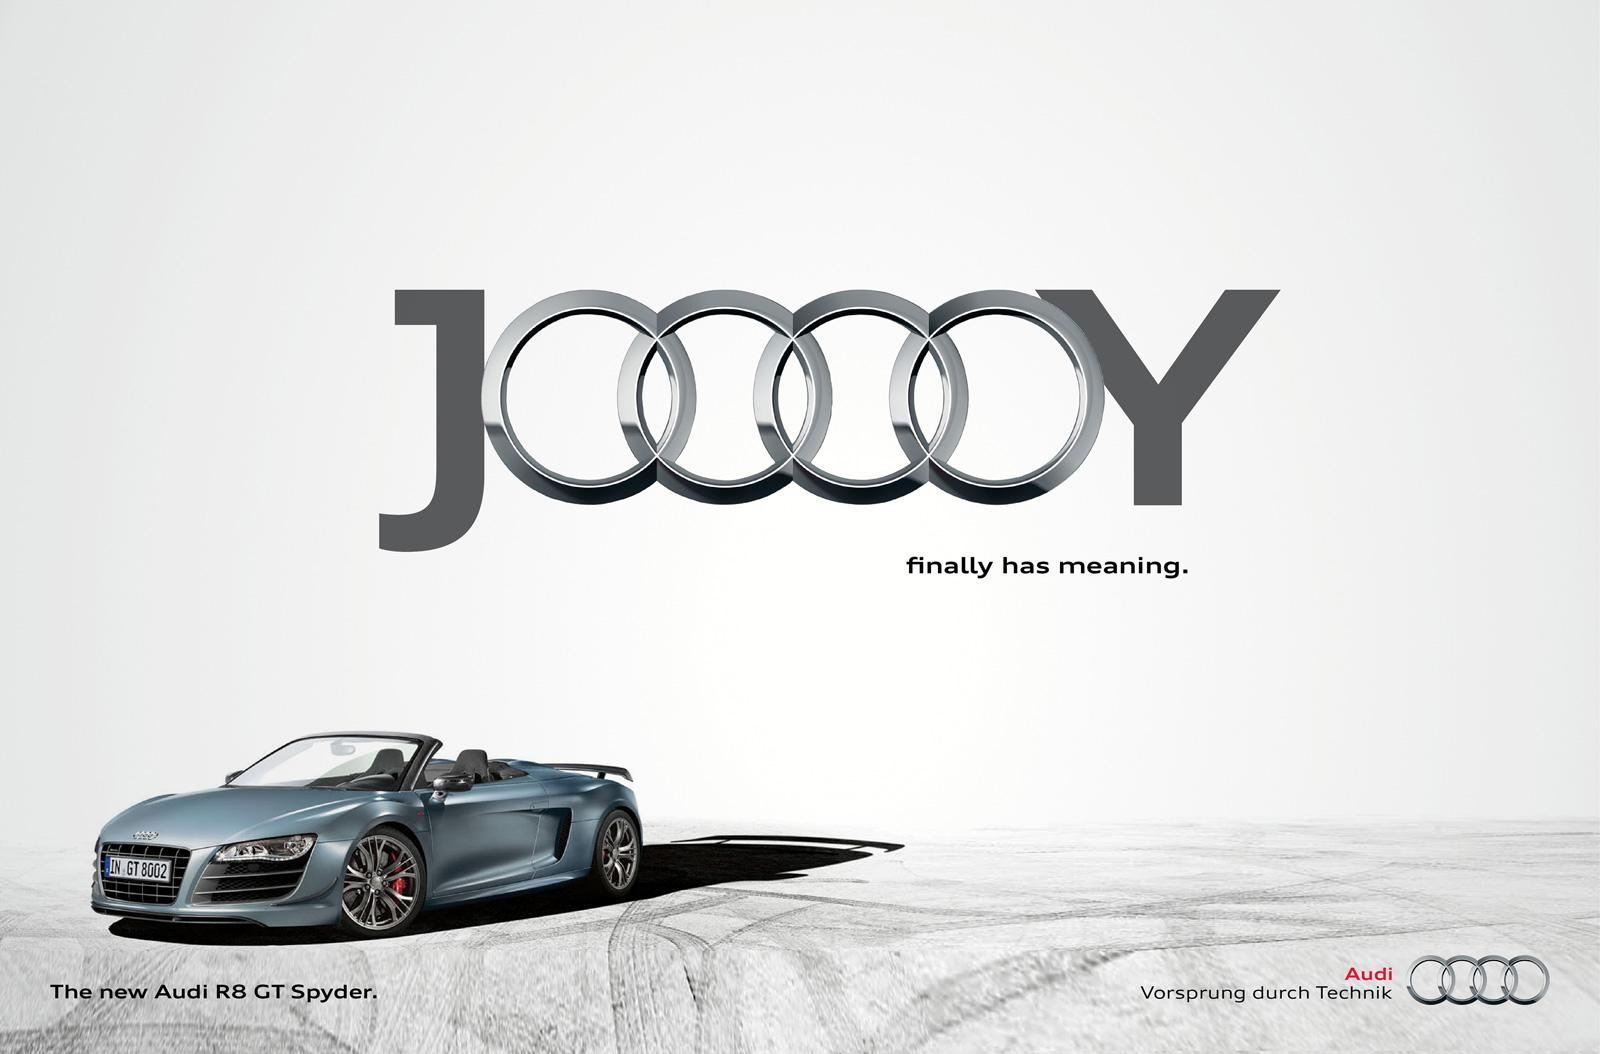 Audi Print Ad -  Jooooy, White